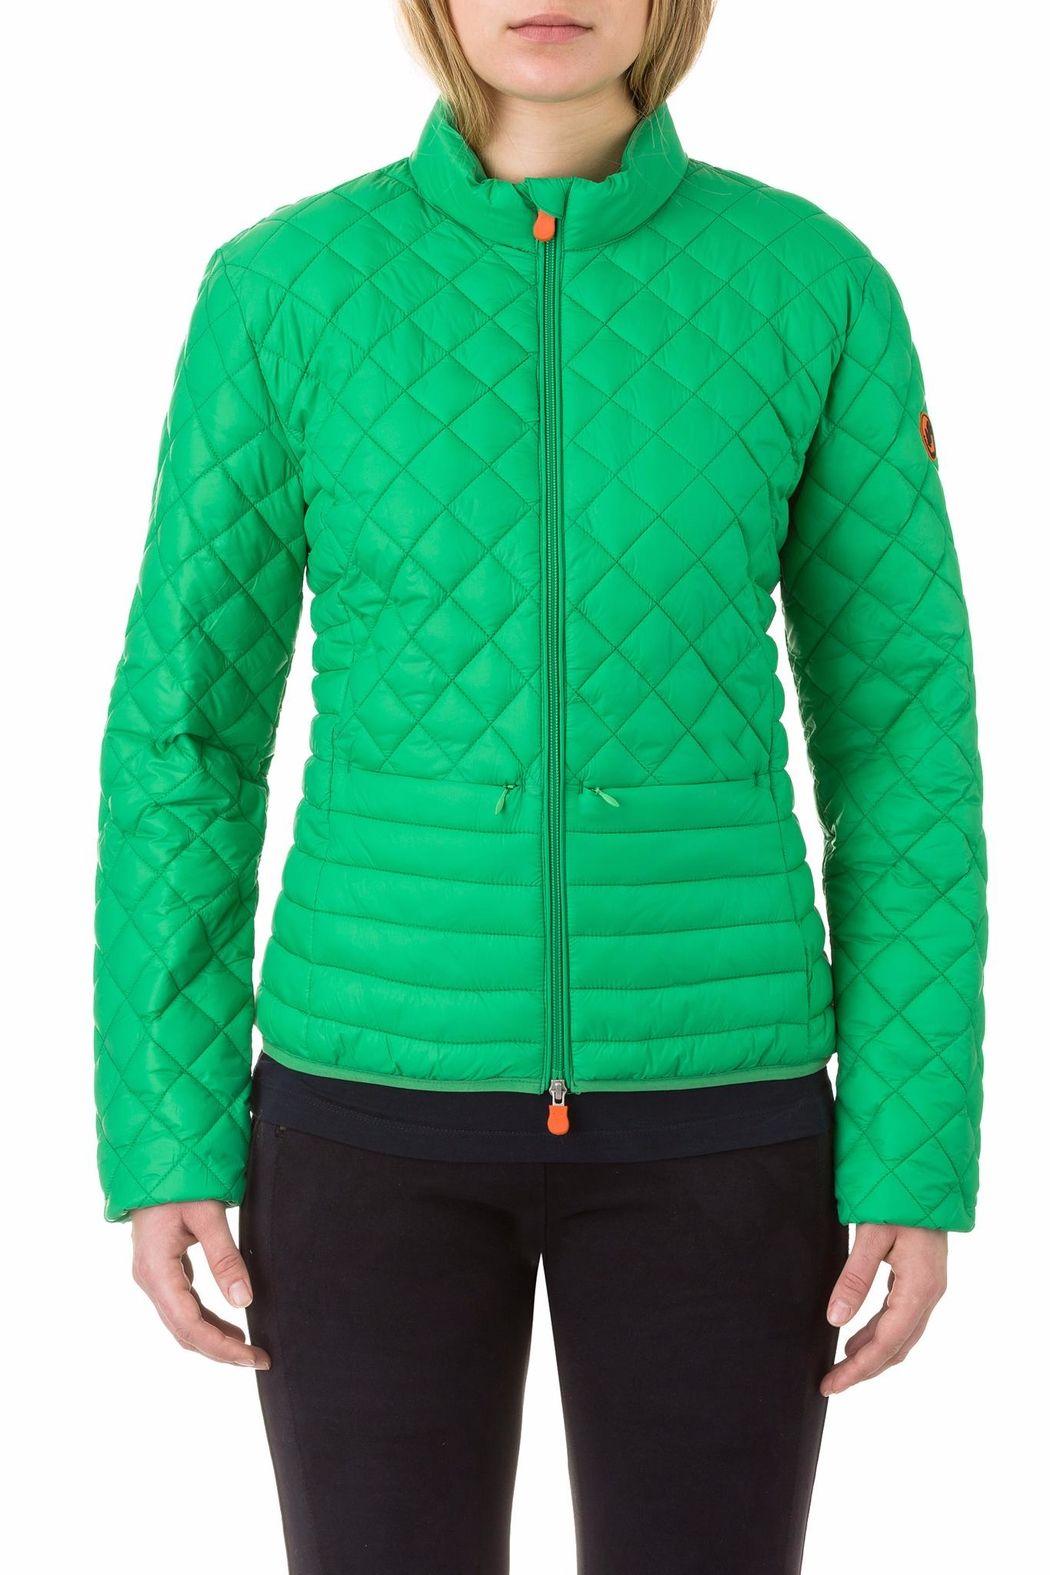 Lightweight Puffer Jacket Stylish Outerwear Jackets Puffer Jackets [ 1575 x 1050 Pixel ]